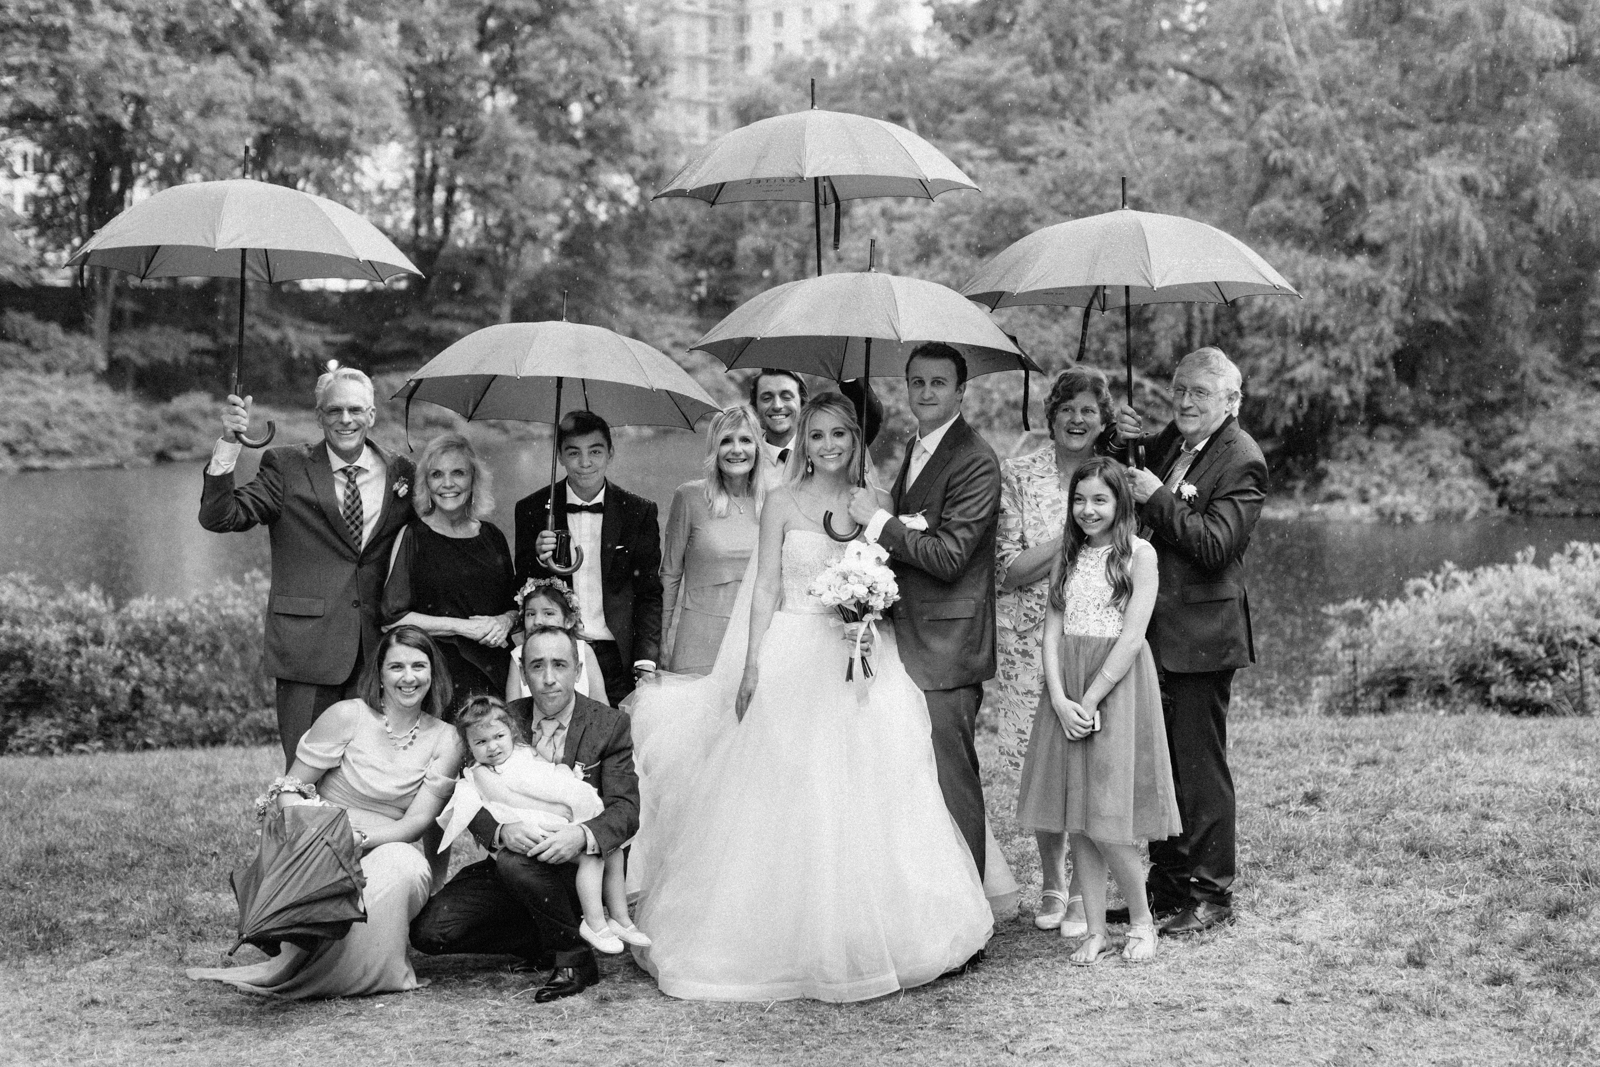 NYC Wedding Photography Sofitel Central Park Brooklyn Photographer Boris Zaretsky _B2C2507.jpg